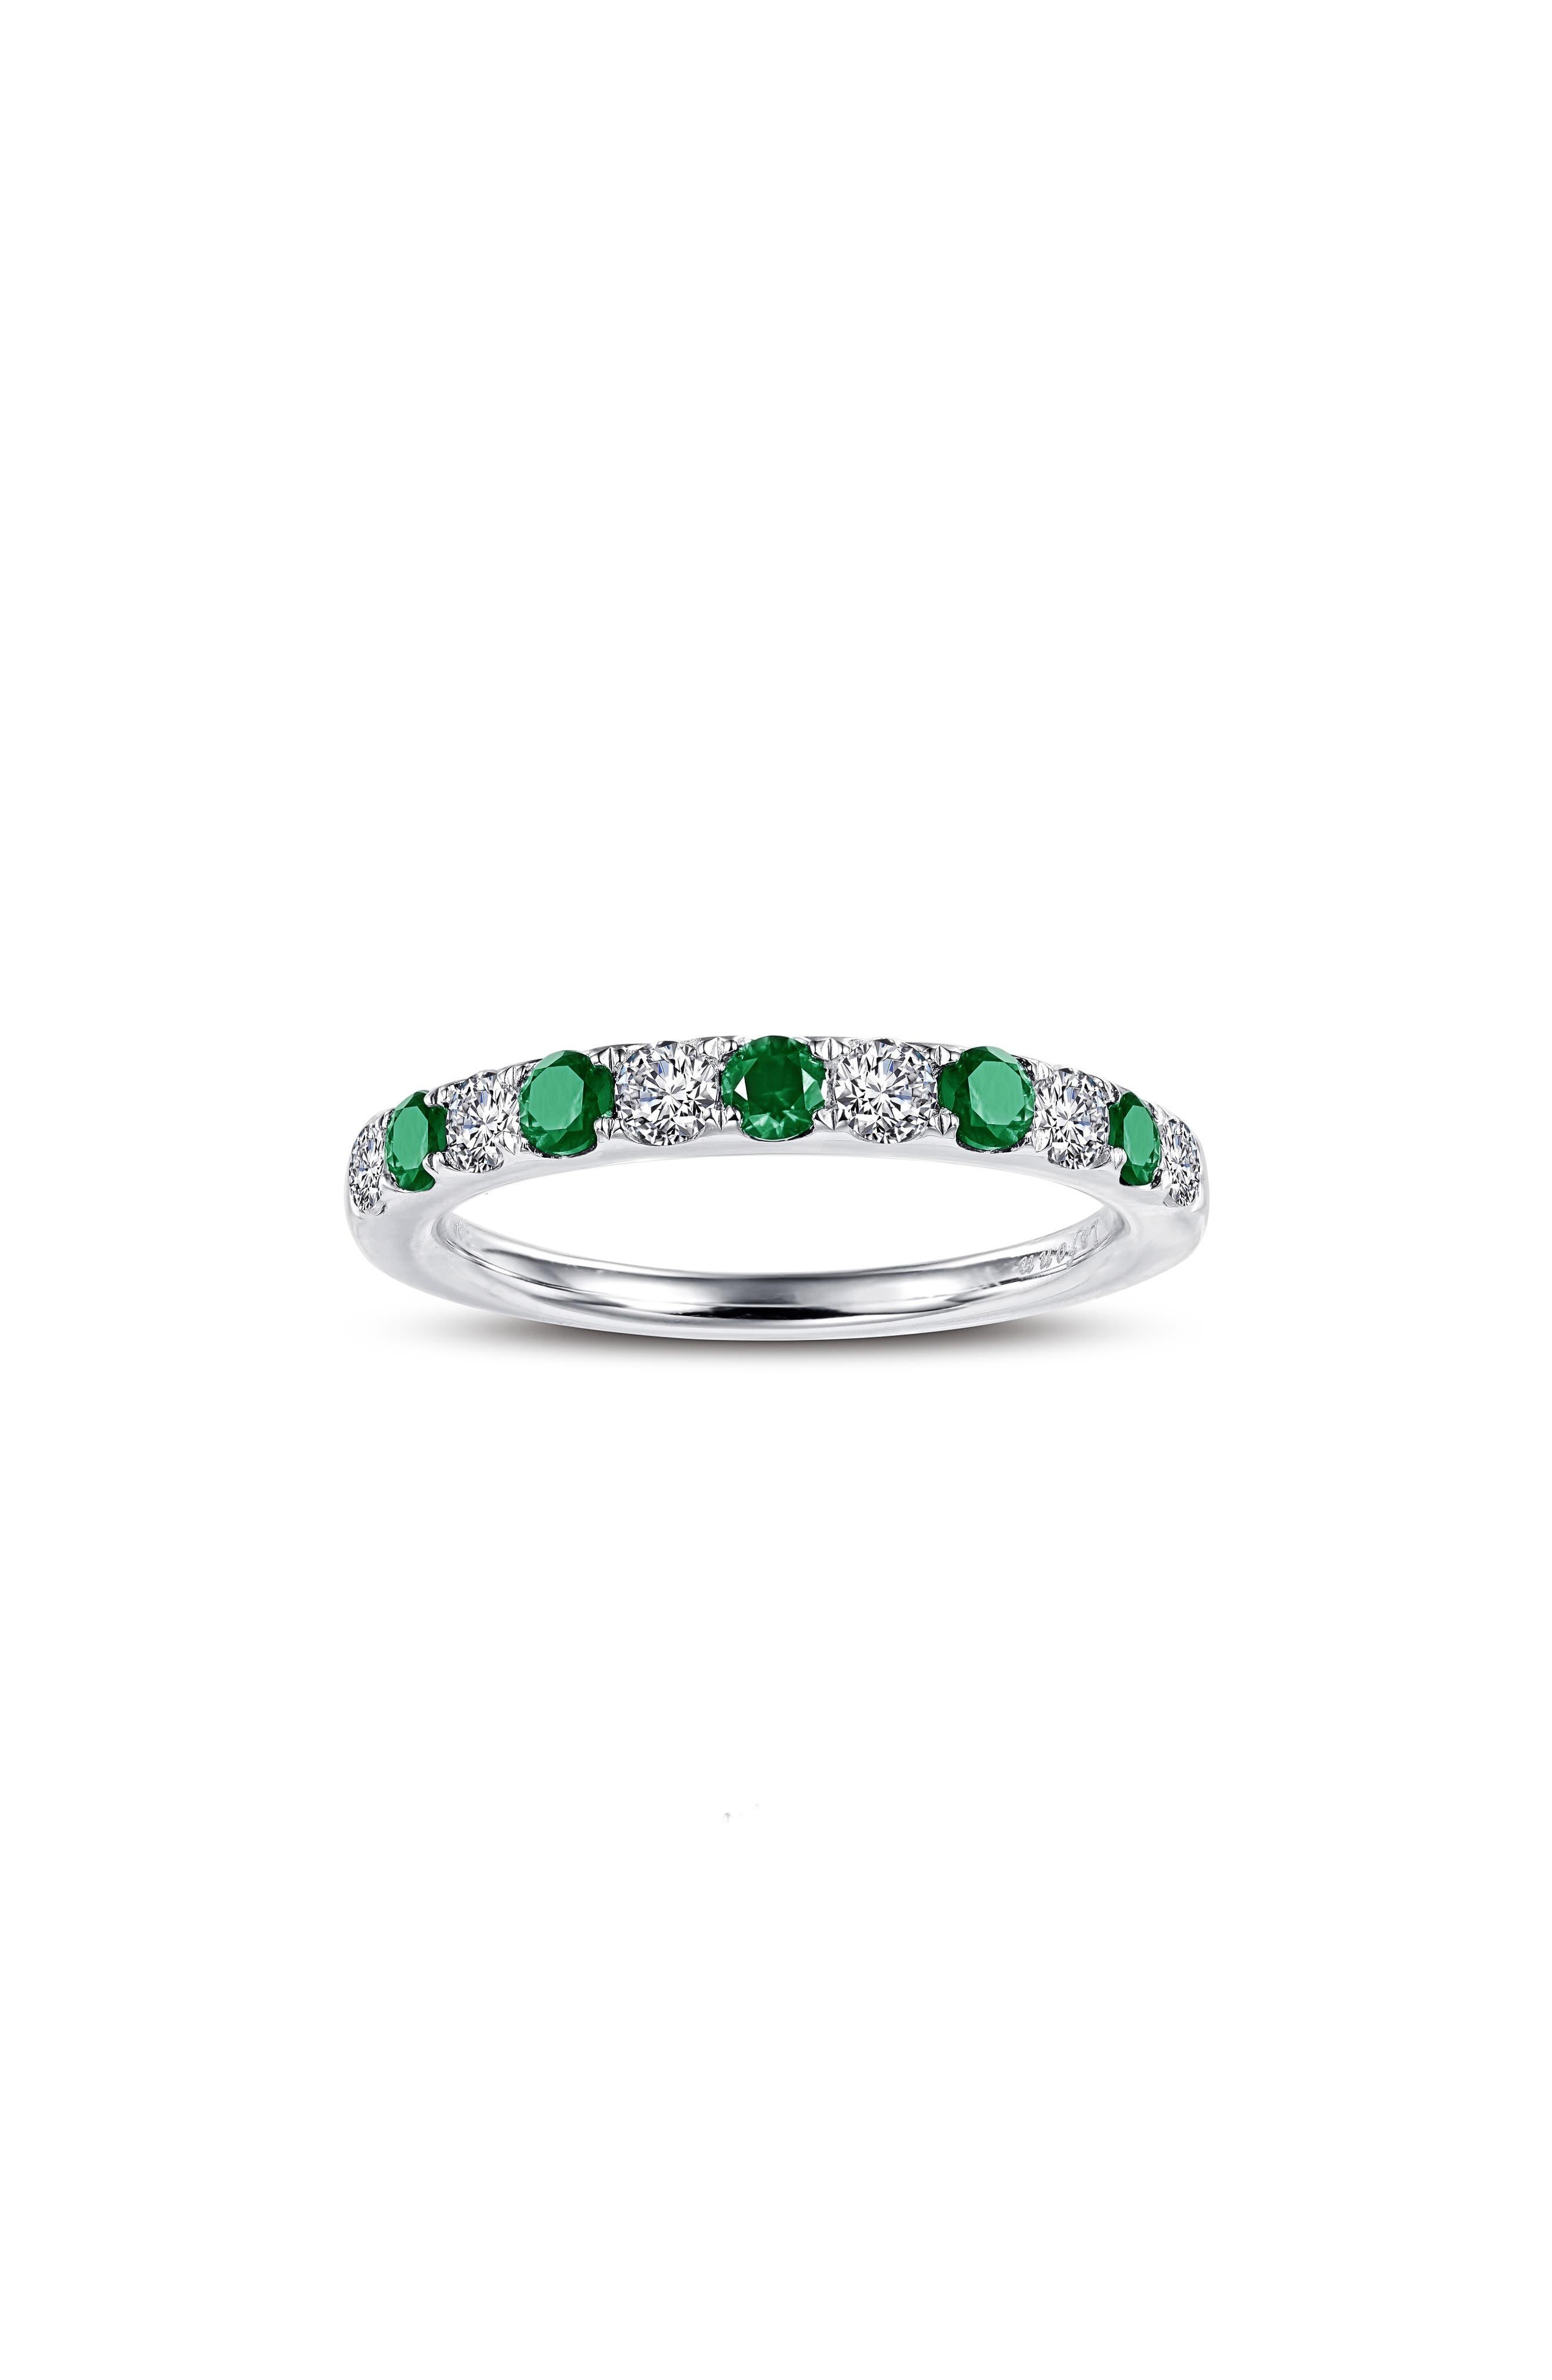 Simulated Diamond Birthstone Band Ring,                         Main,                         color, MAY - GREEN/ SILVER